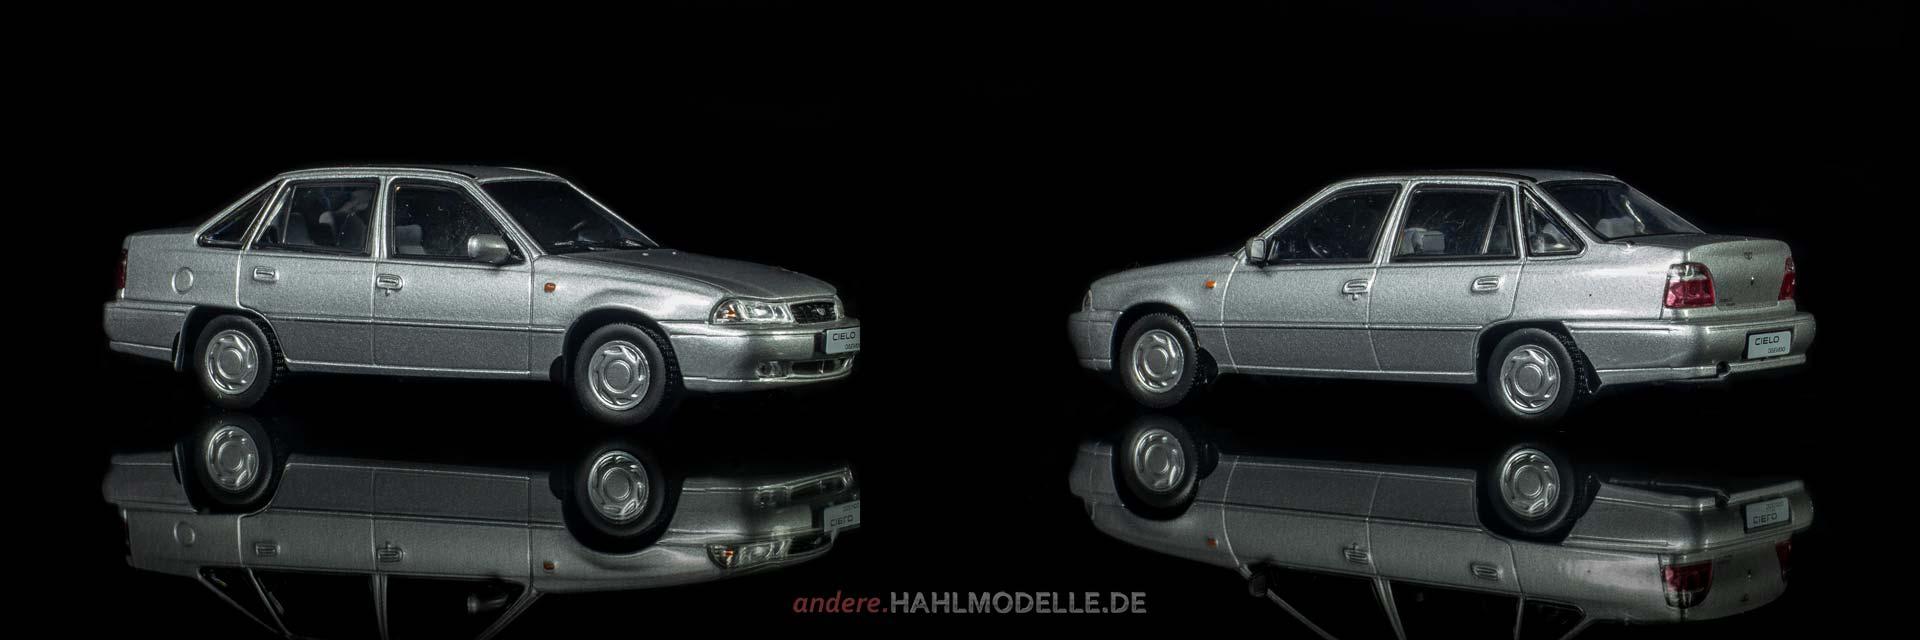 Daewoo Nexia | Limousine | Ixo | 1:43 | www.andere.hahlmodelle.de